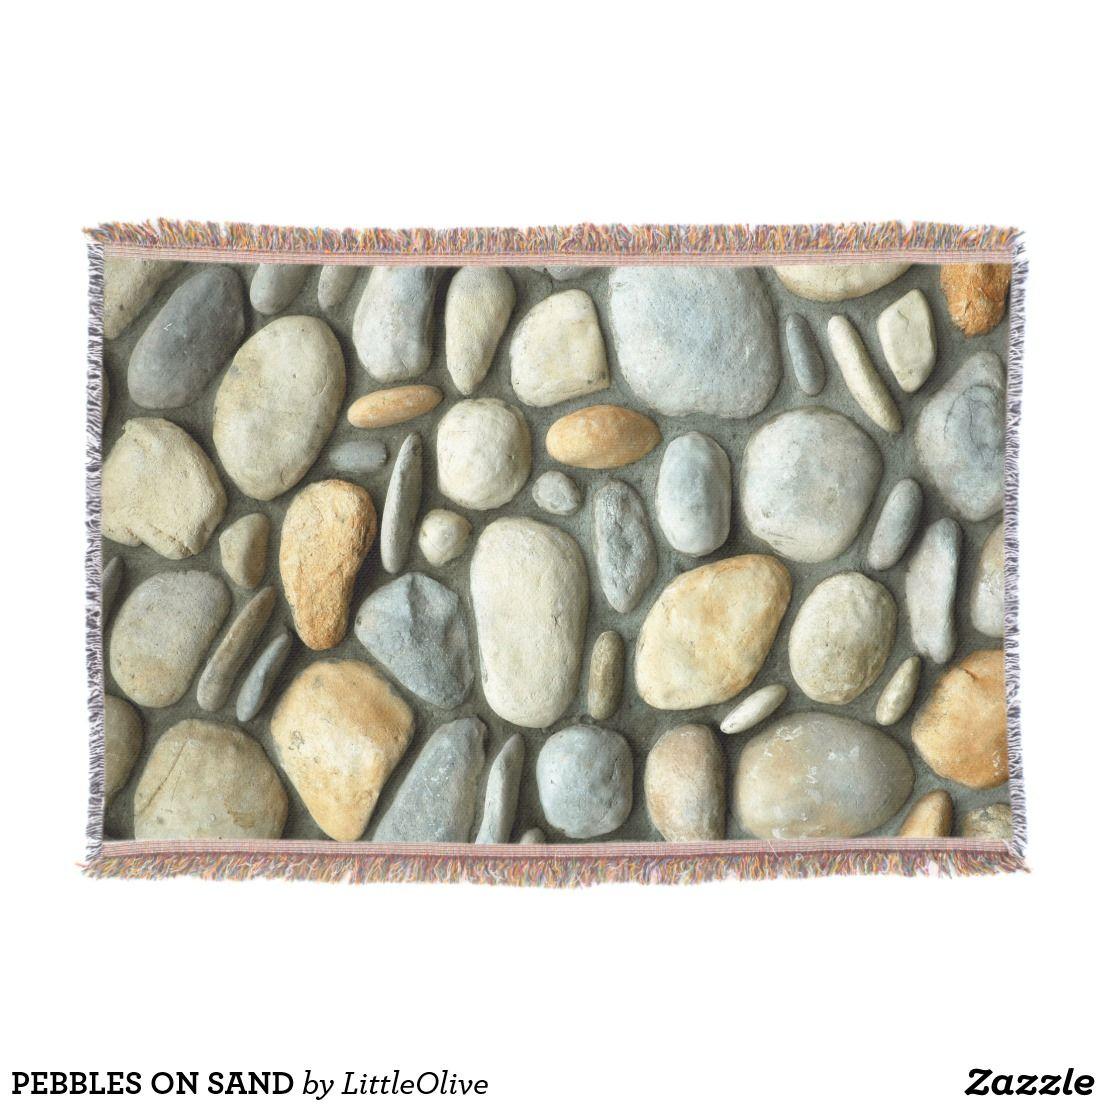 PEBBLES ON SAND THROW BLANKET Zazzle.co.uk Pebbles